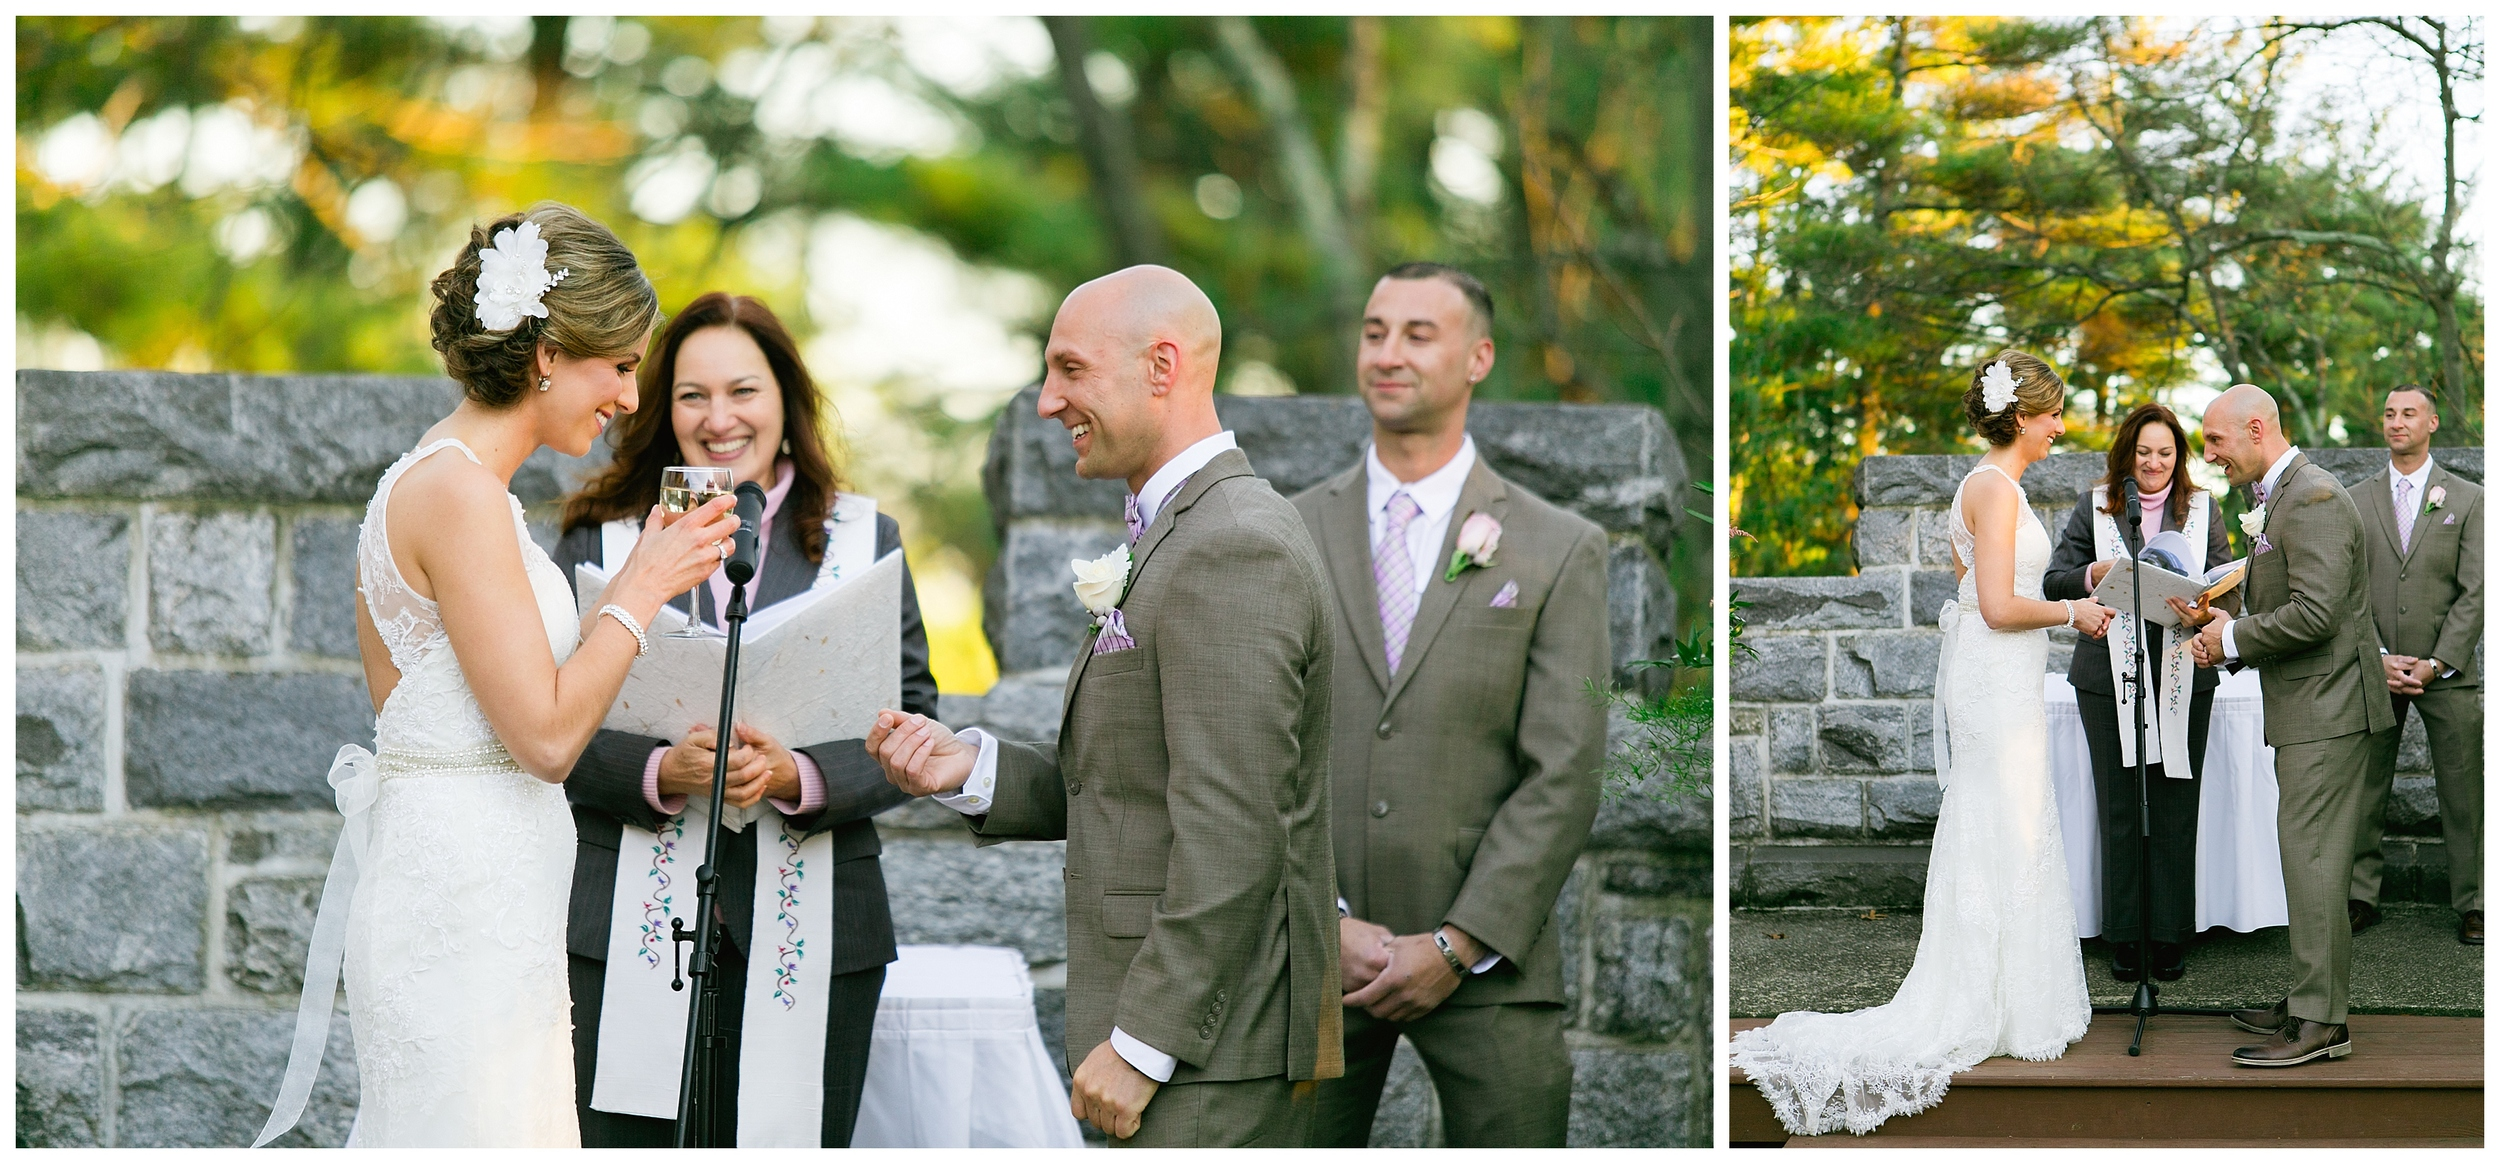 Searles Castle wedding emily tebbetts photography new england wedding